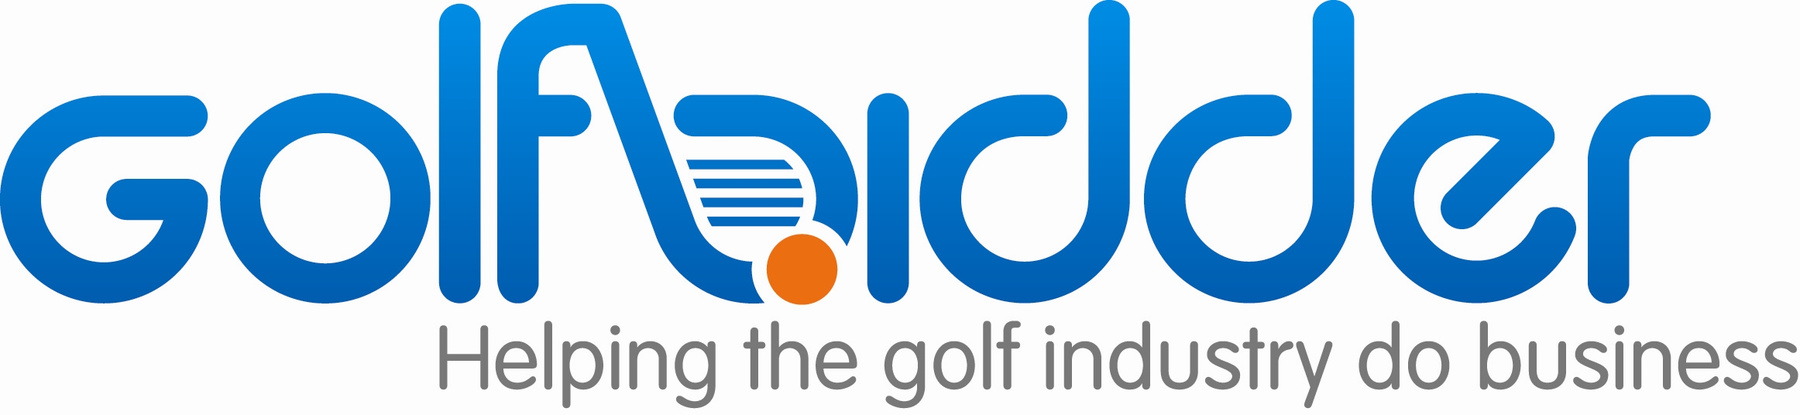 Golfbidder Logo